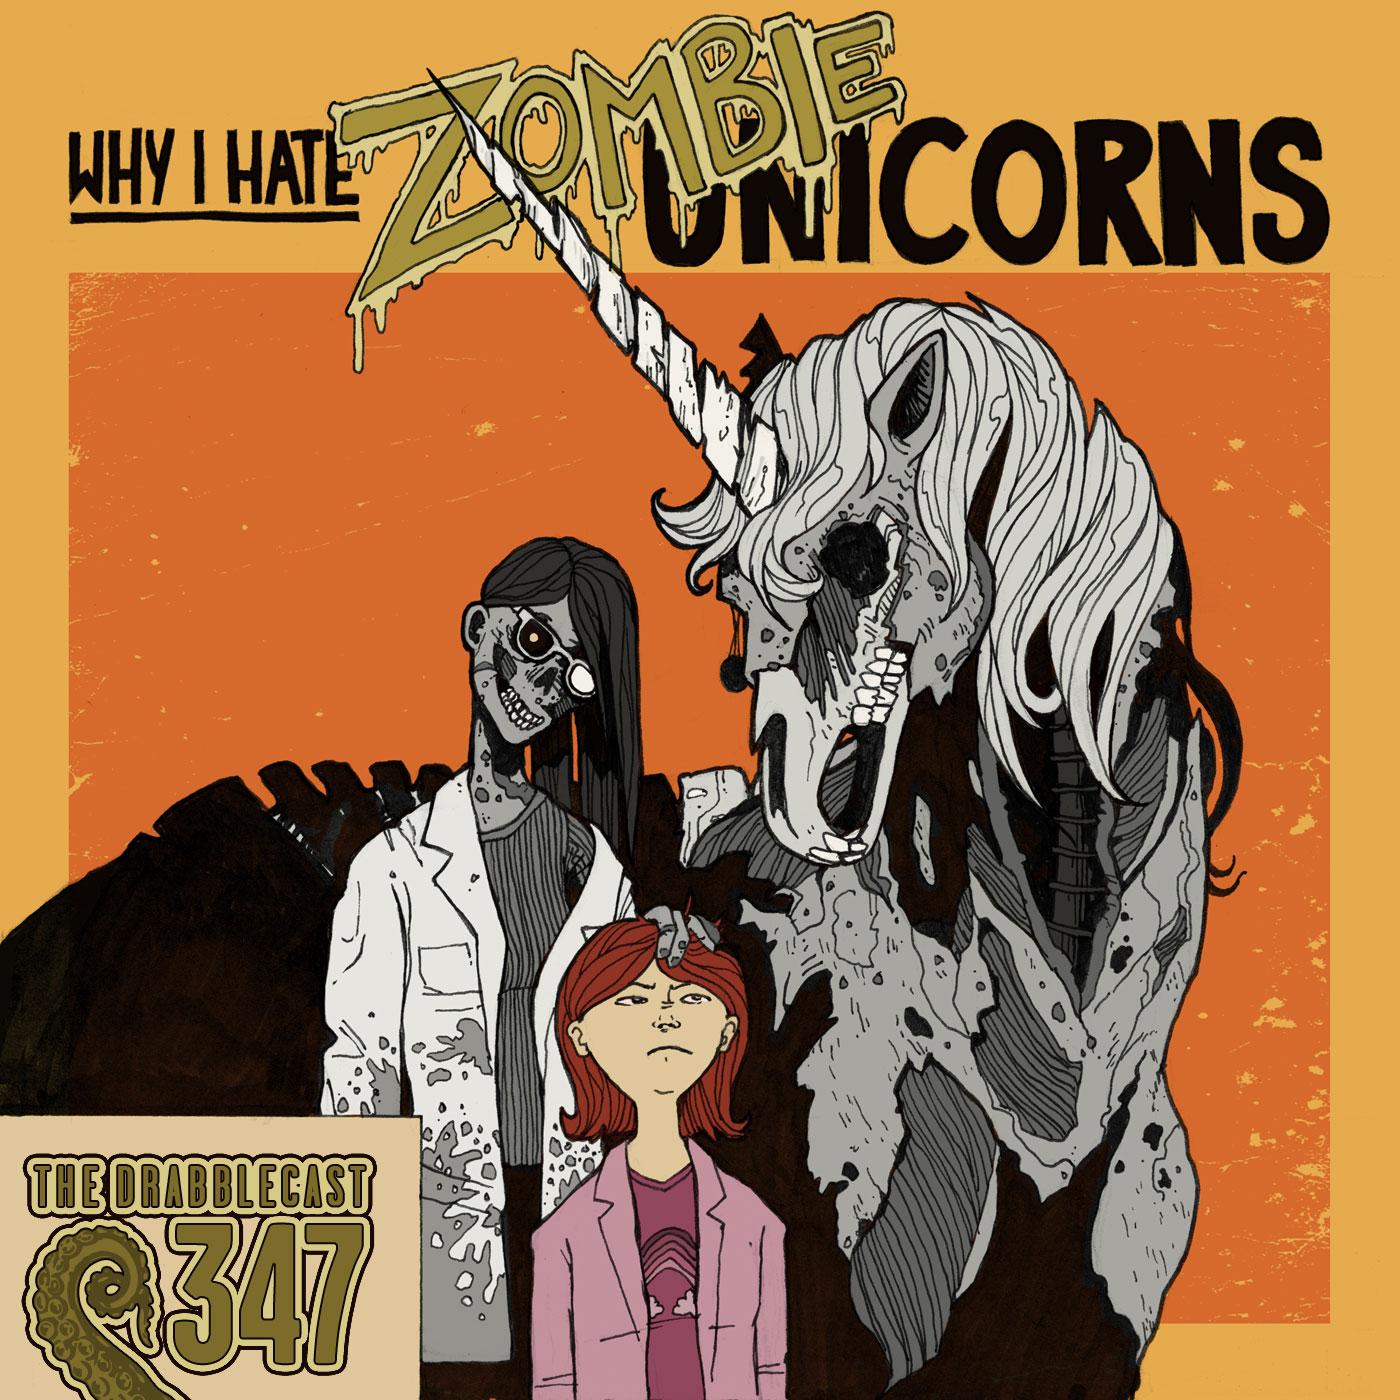 Drabblecast episode 347, Why I Hate Zombie Unicorns, by David Flett